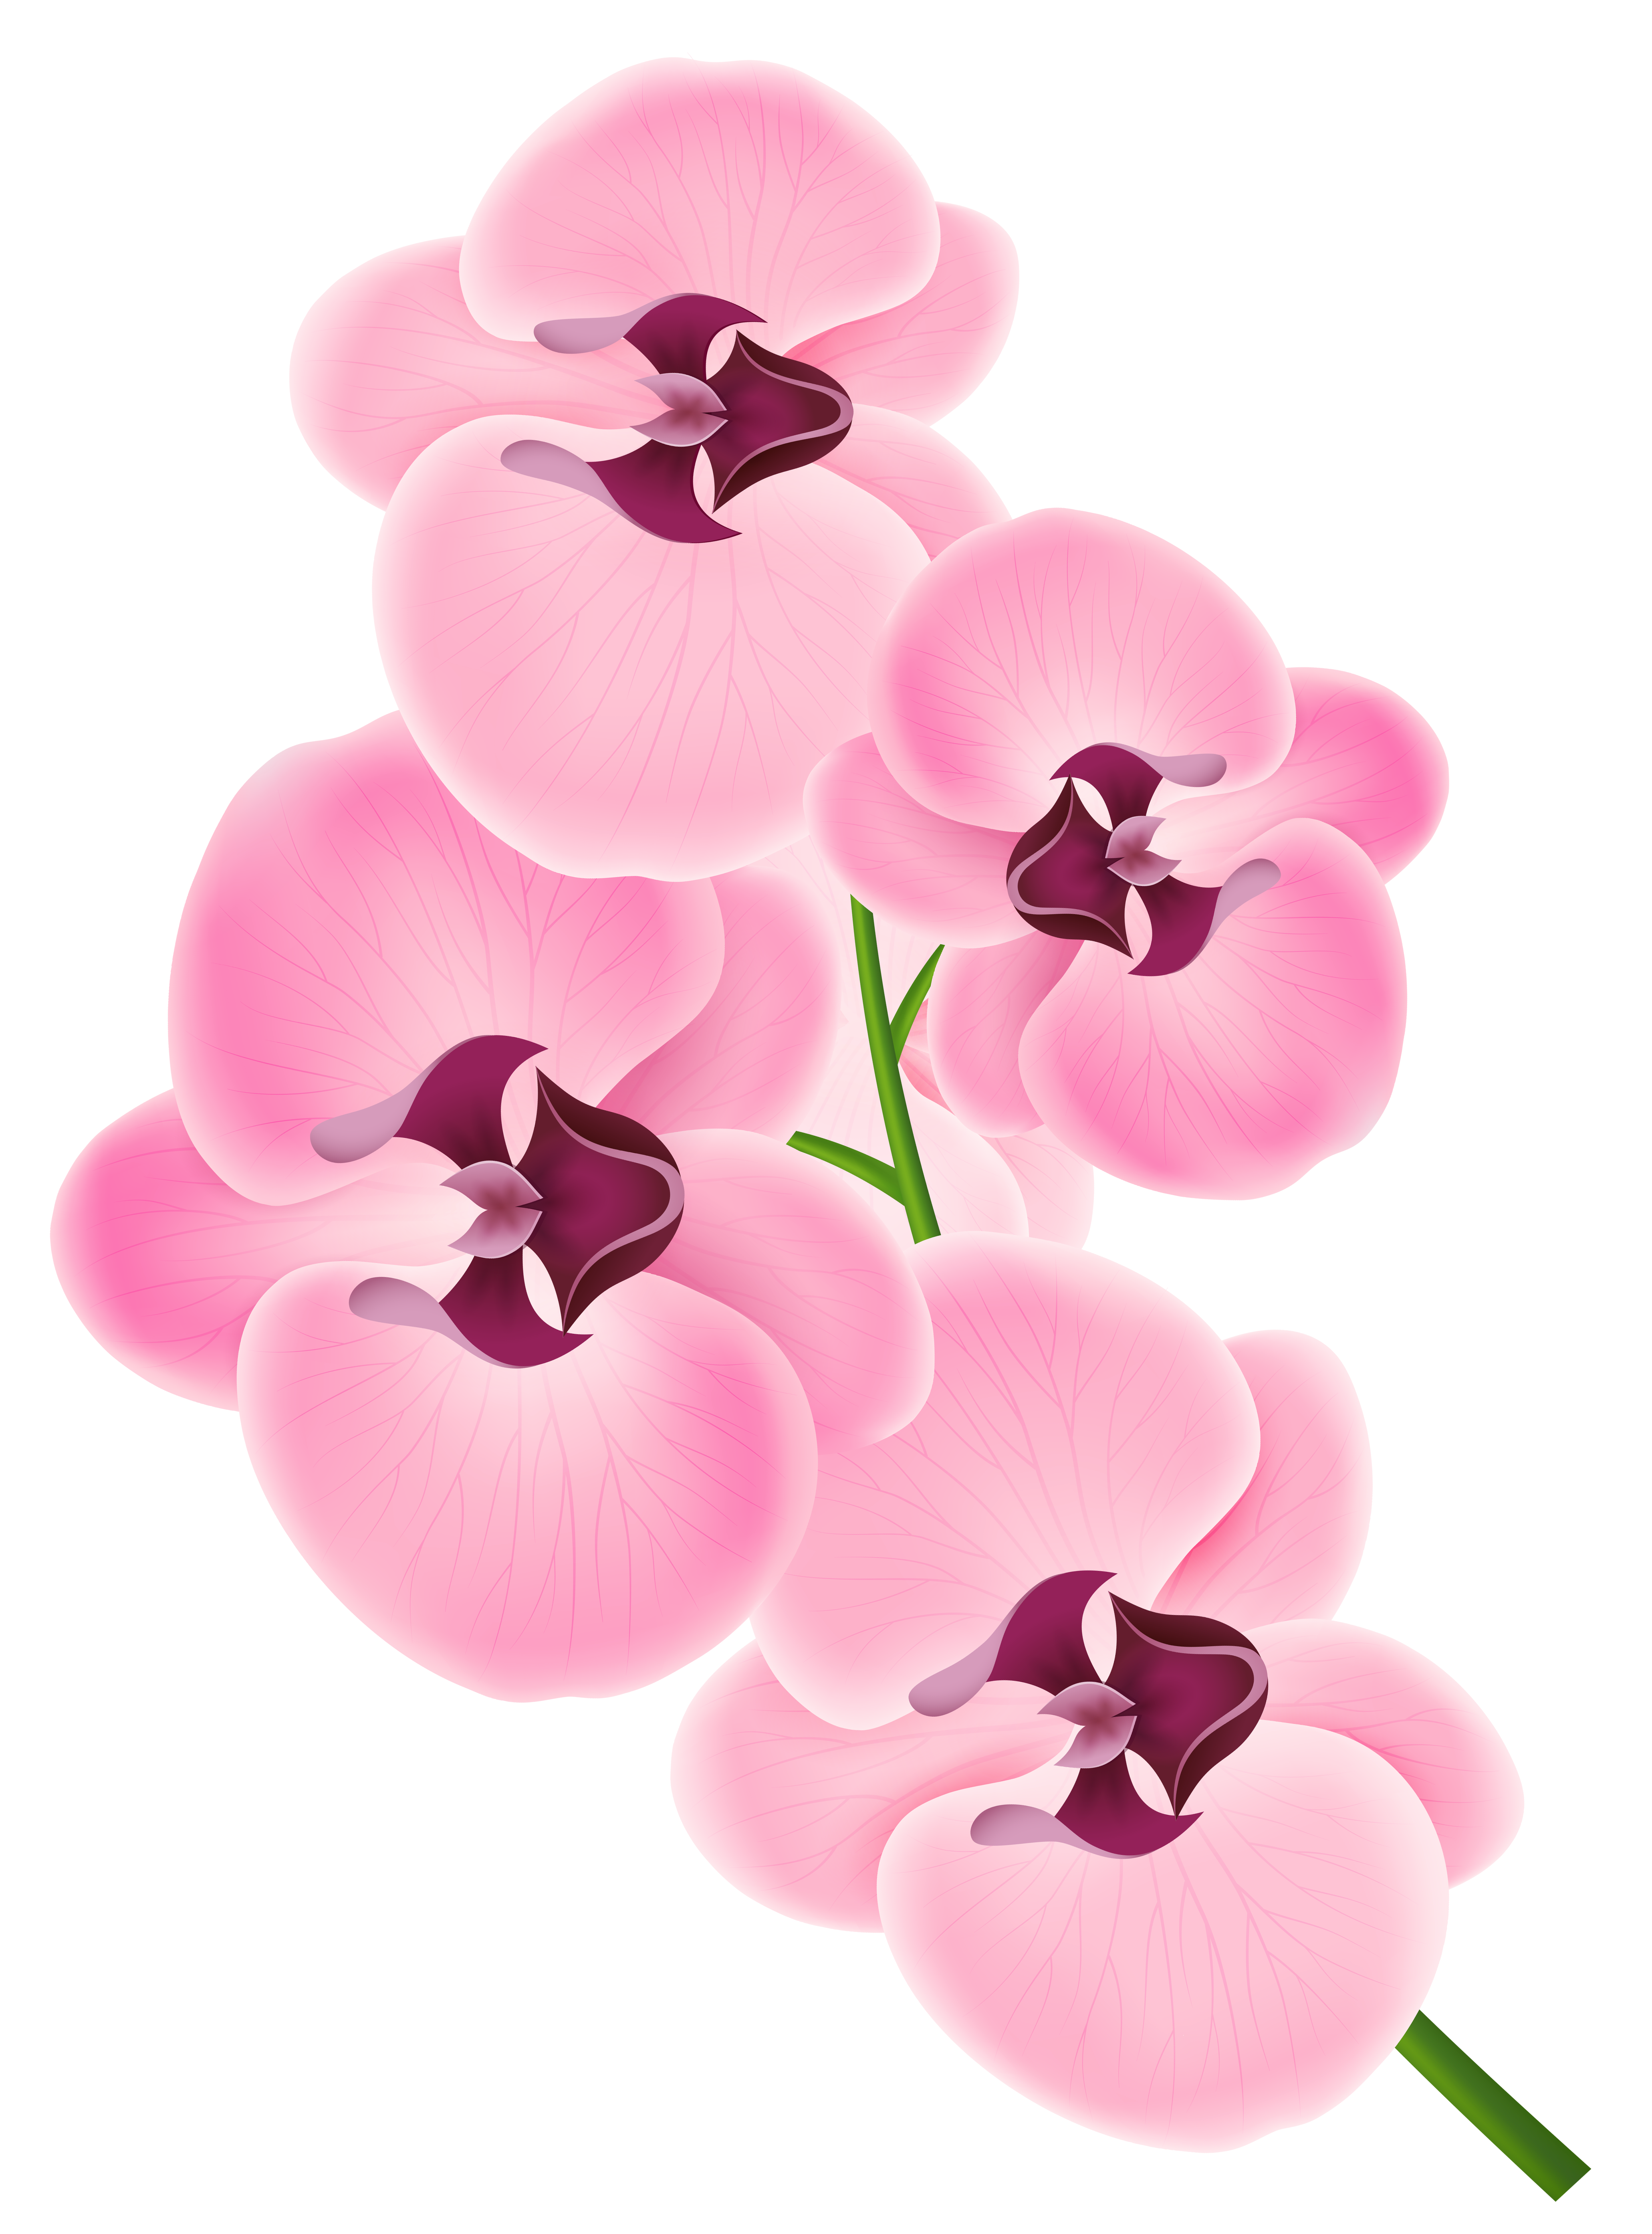 Snapdragon flower clipart clipart transparent stock orchid png - Поиск в Google | Cuba party moodboard | Pinterest ... clipart transparent stock